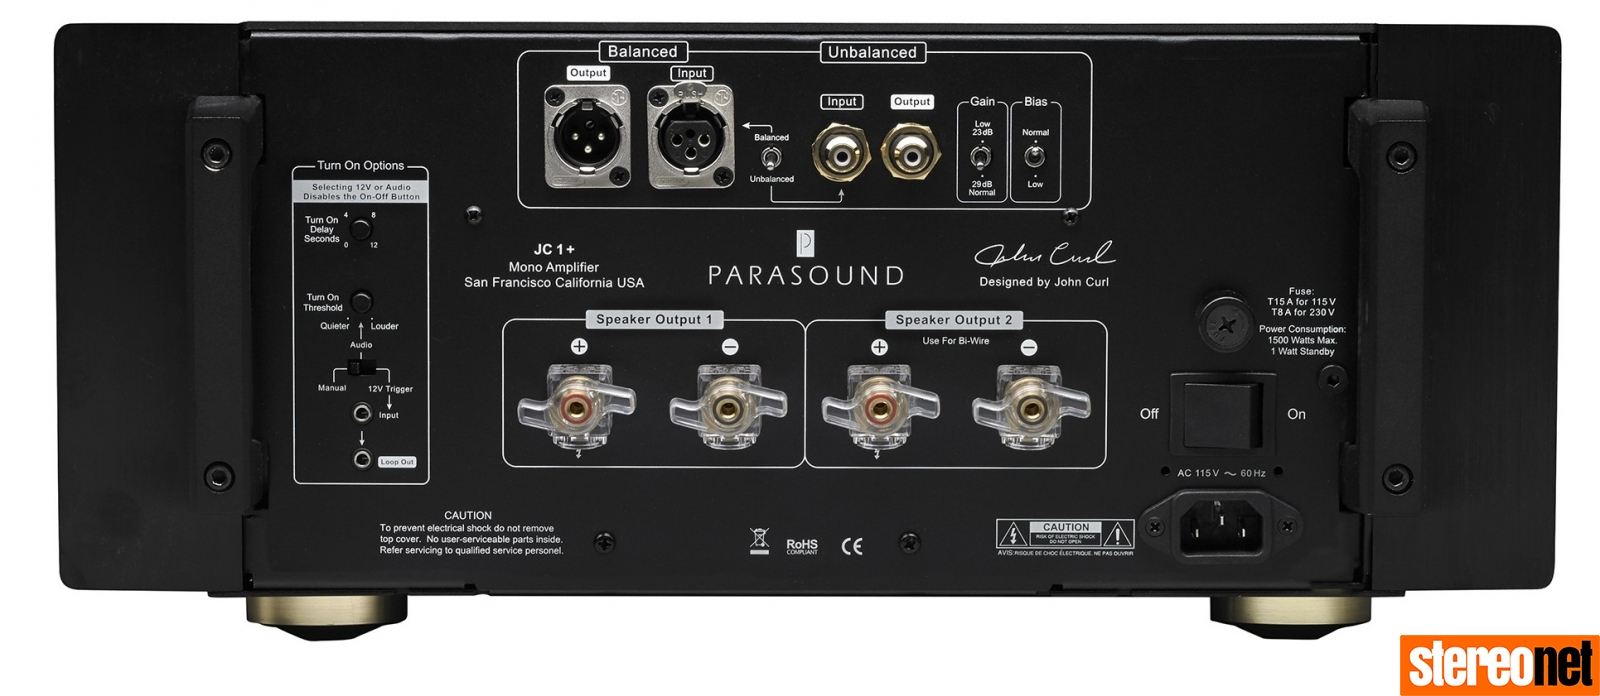 Parasound Halo JC 1+ power amp